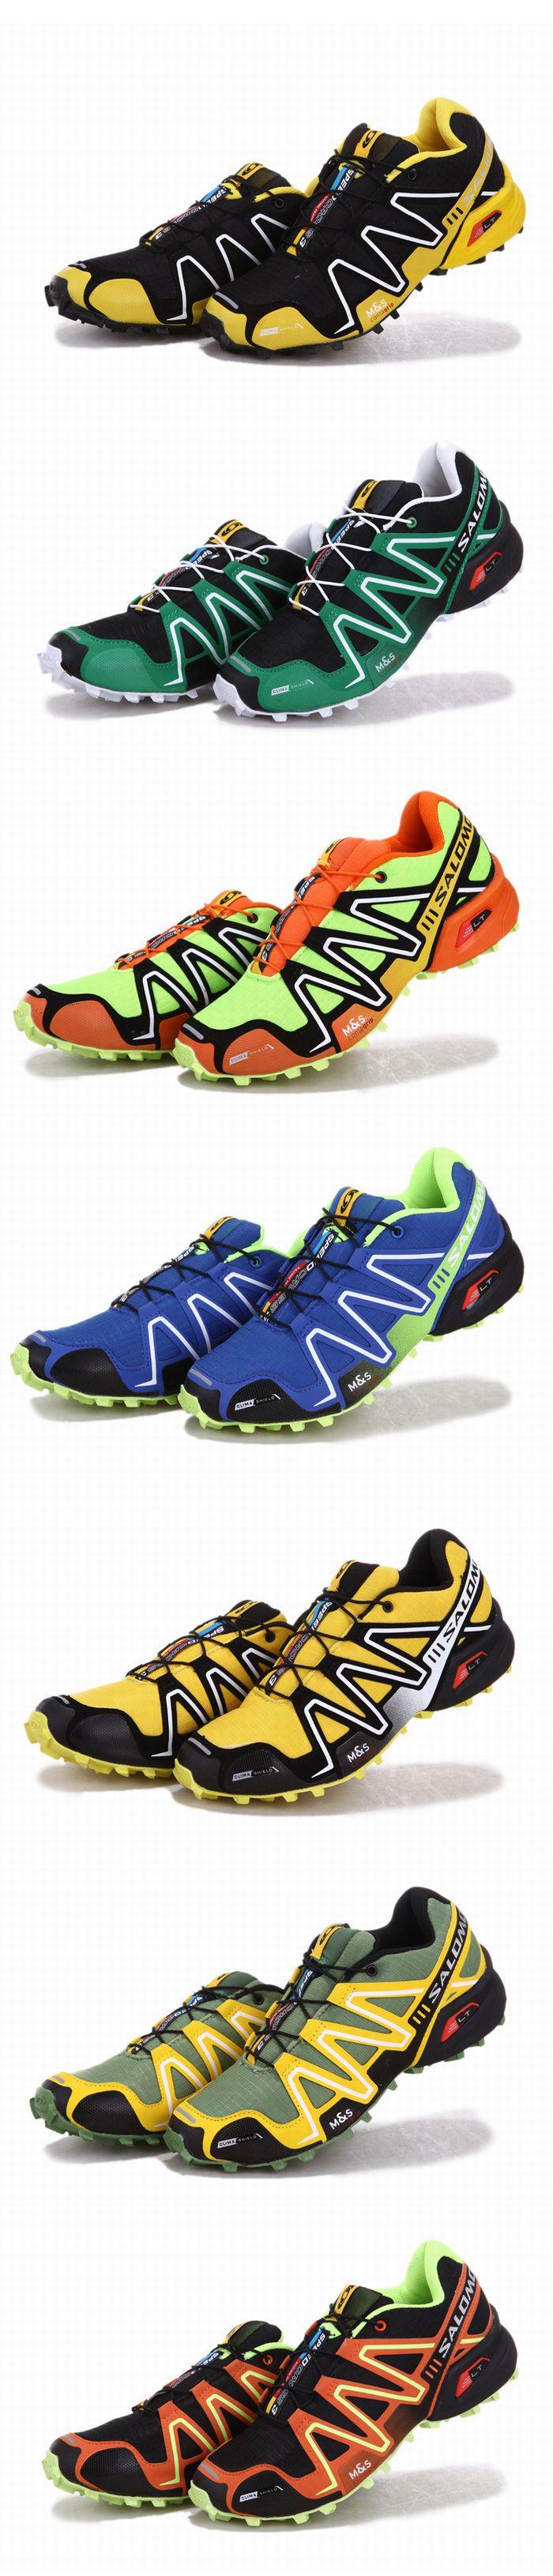 adidas cycling shoes adidas salomon